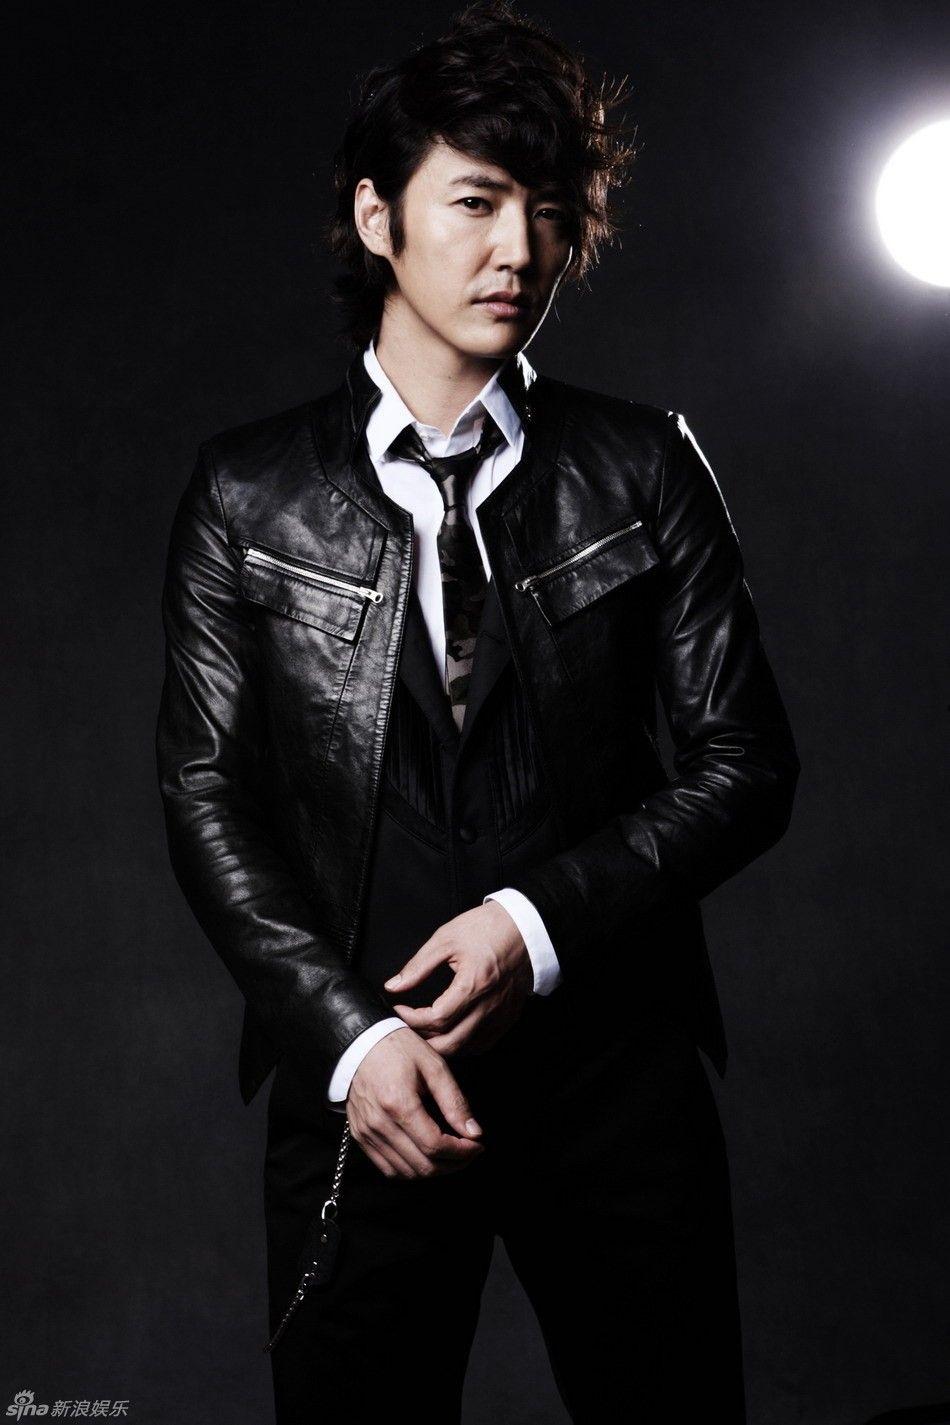 Yoon Sanghyun (윤상현) Picture My fair lady cast, Actors